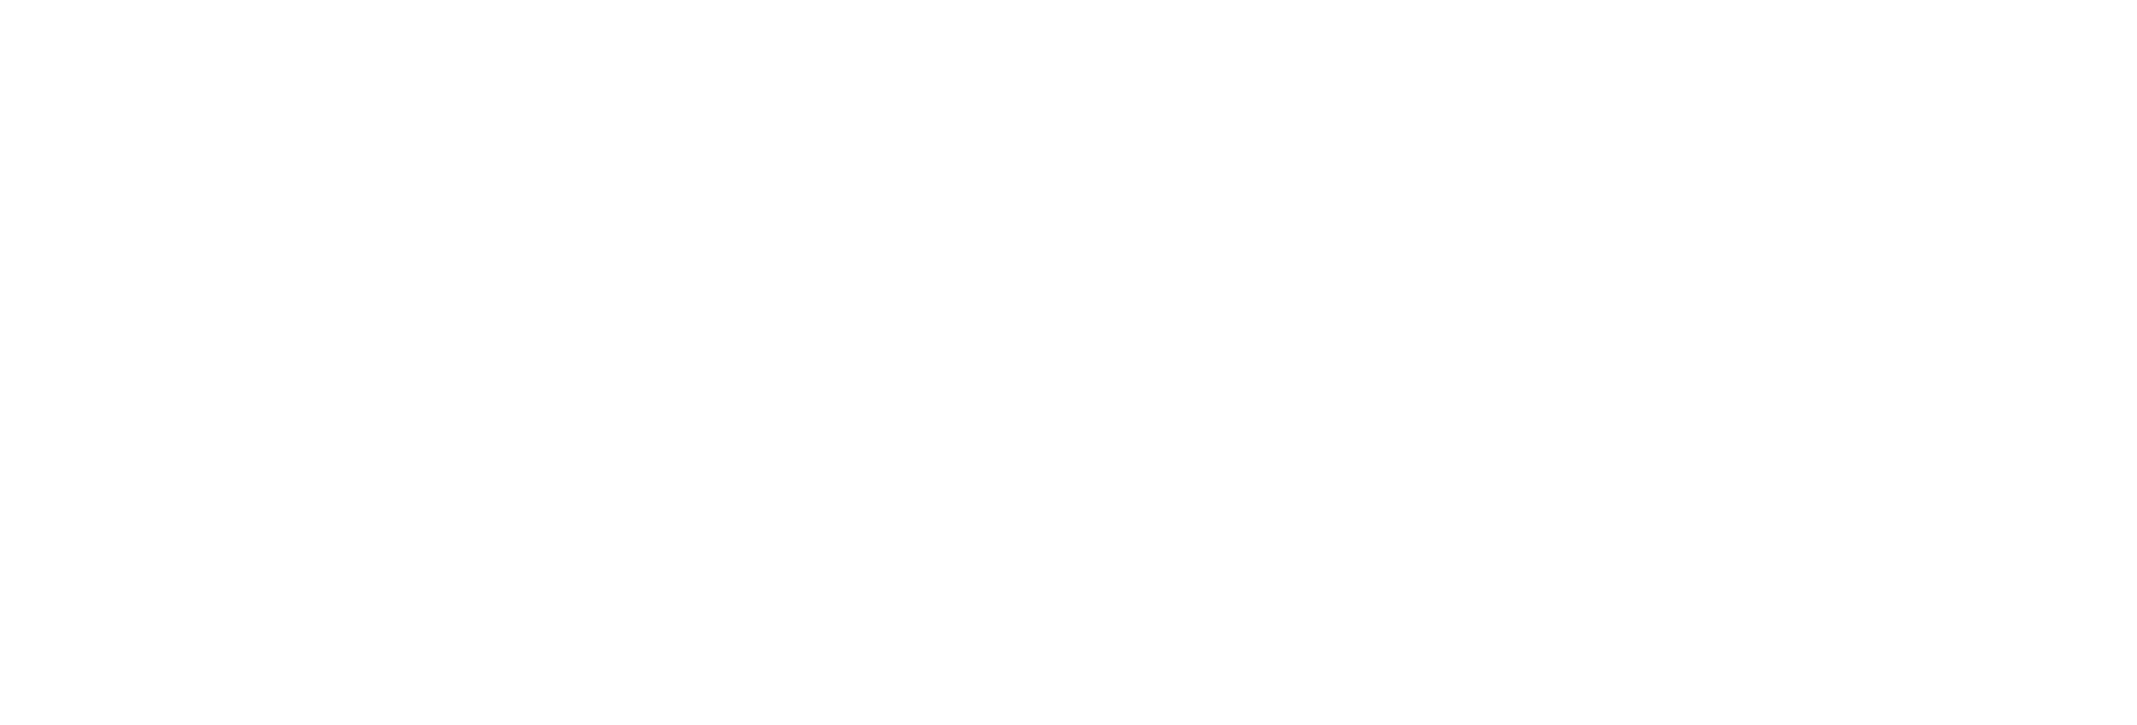 Central American Cargo